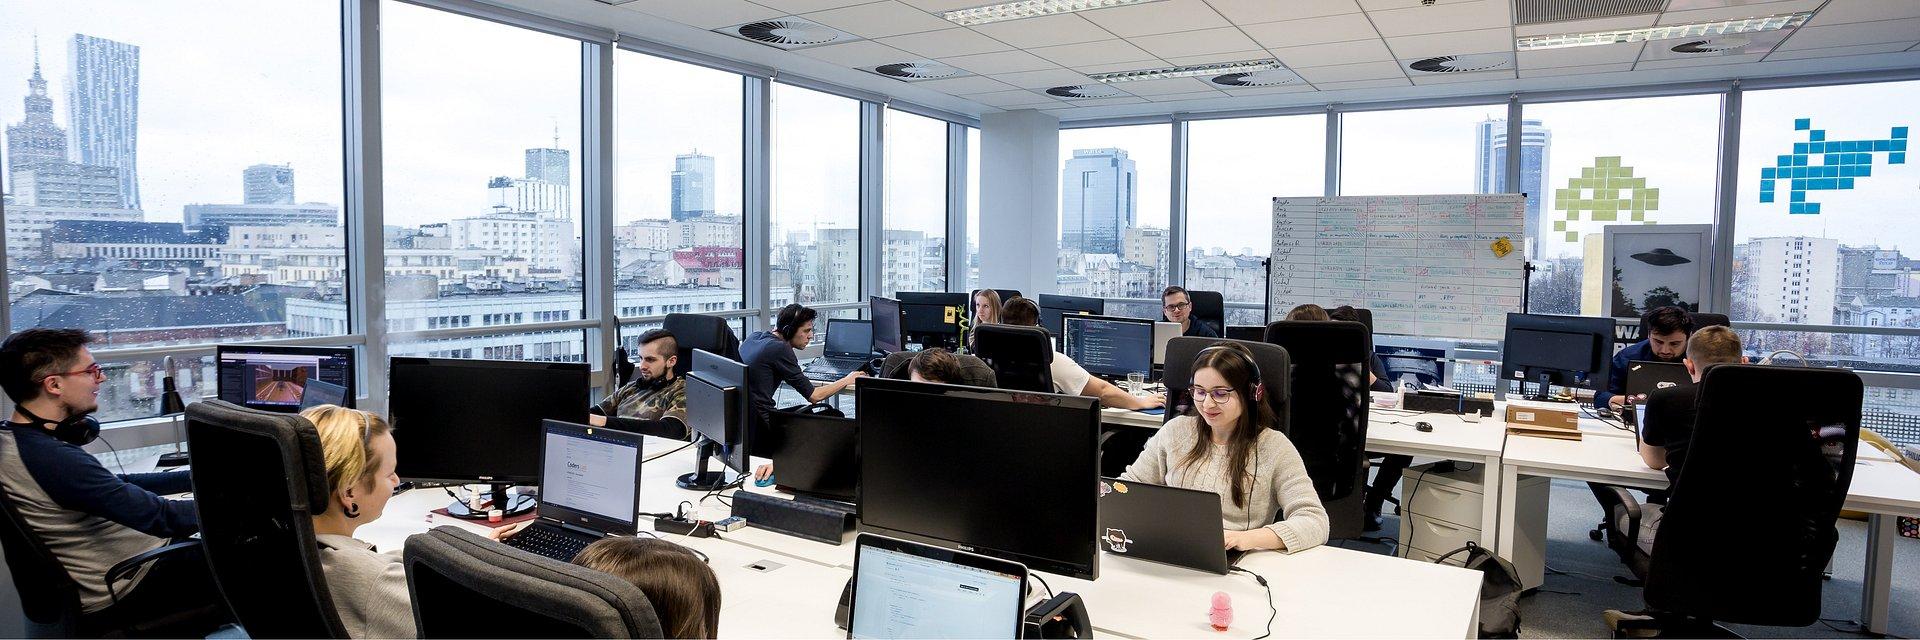 The biggest Polish IT school enters Romania